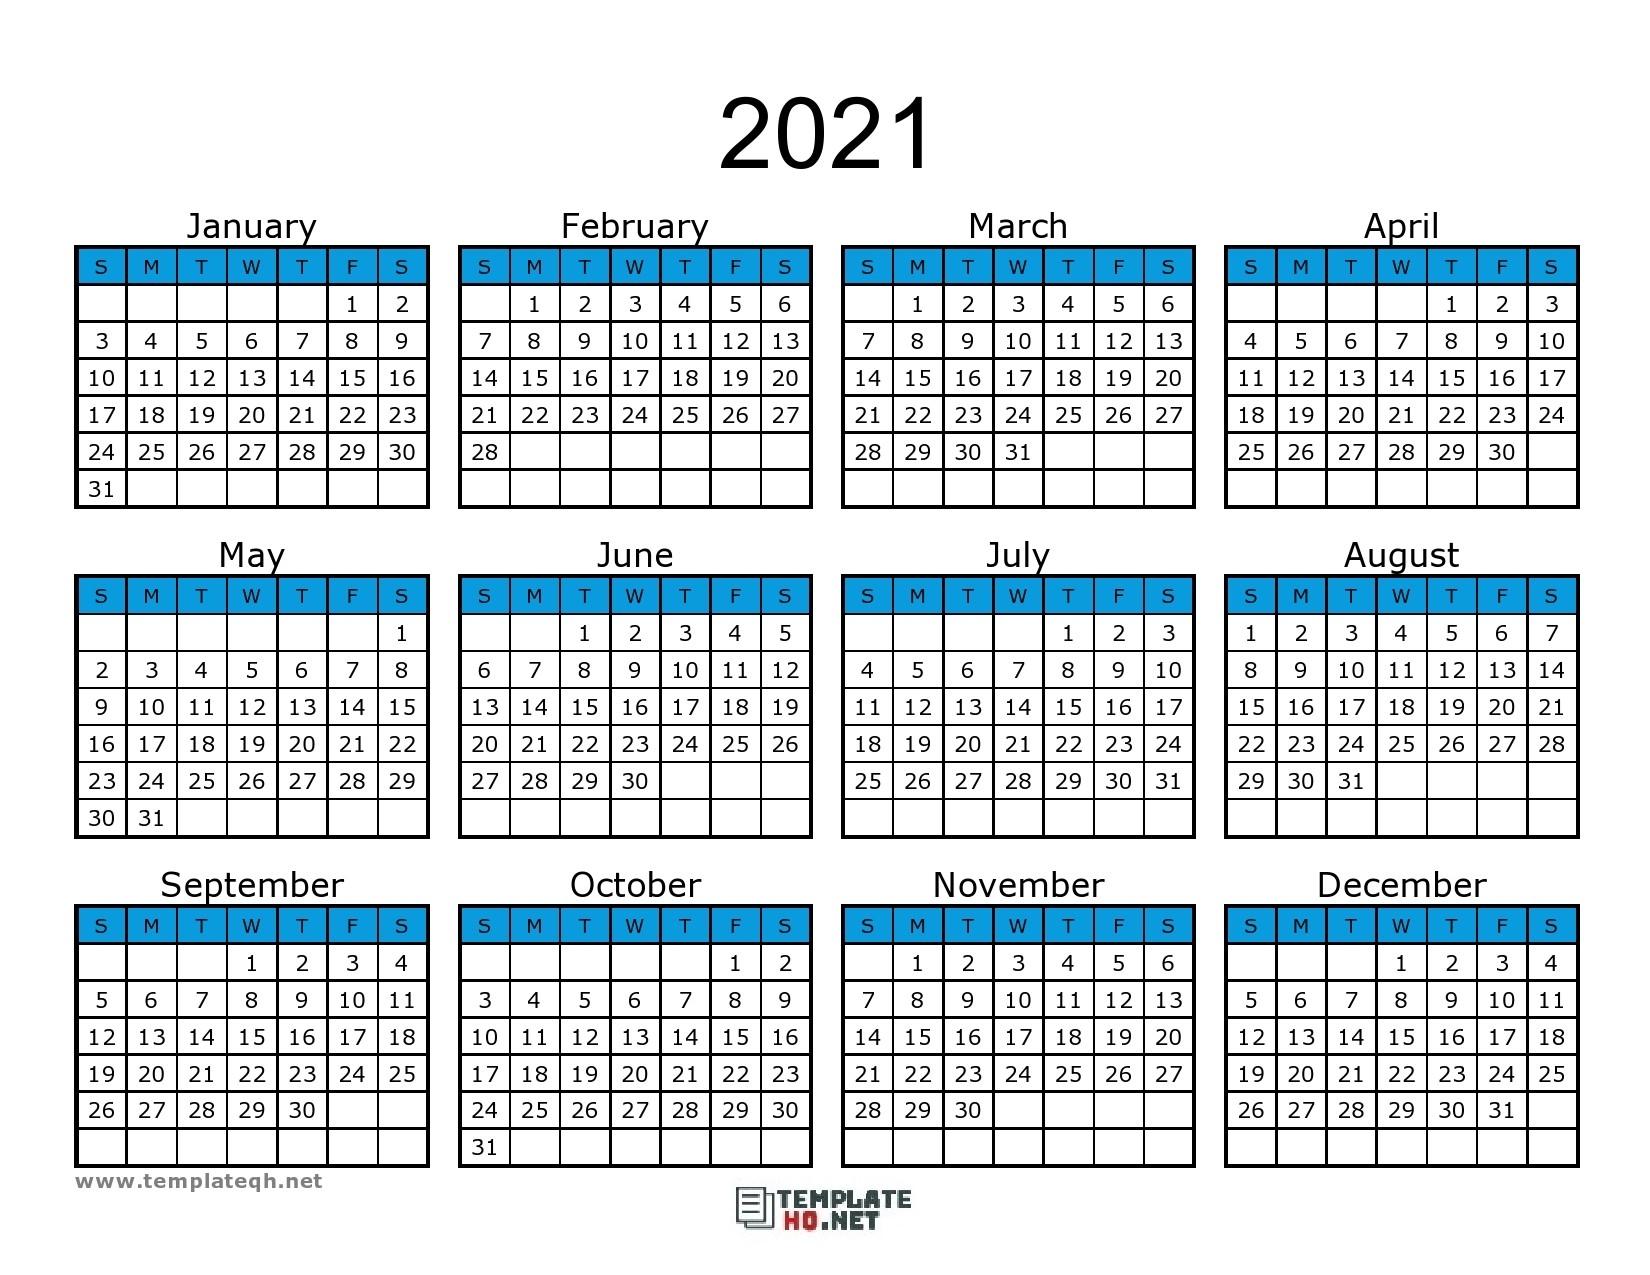 Free 2021 Calendar Printable - Template Hq  2021 Calendar Printable Template